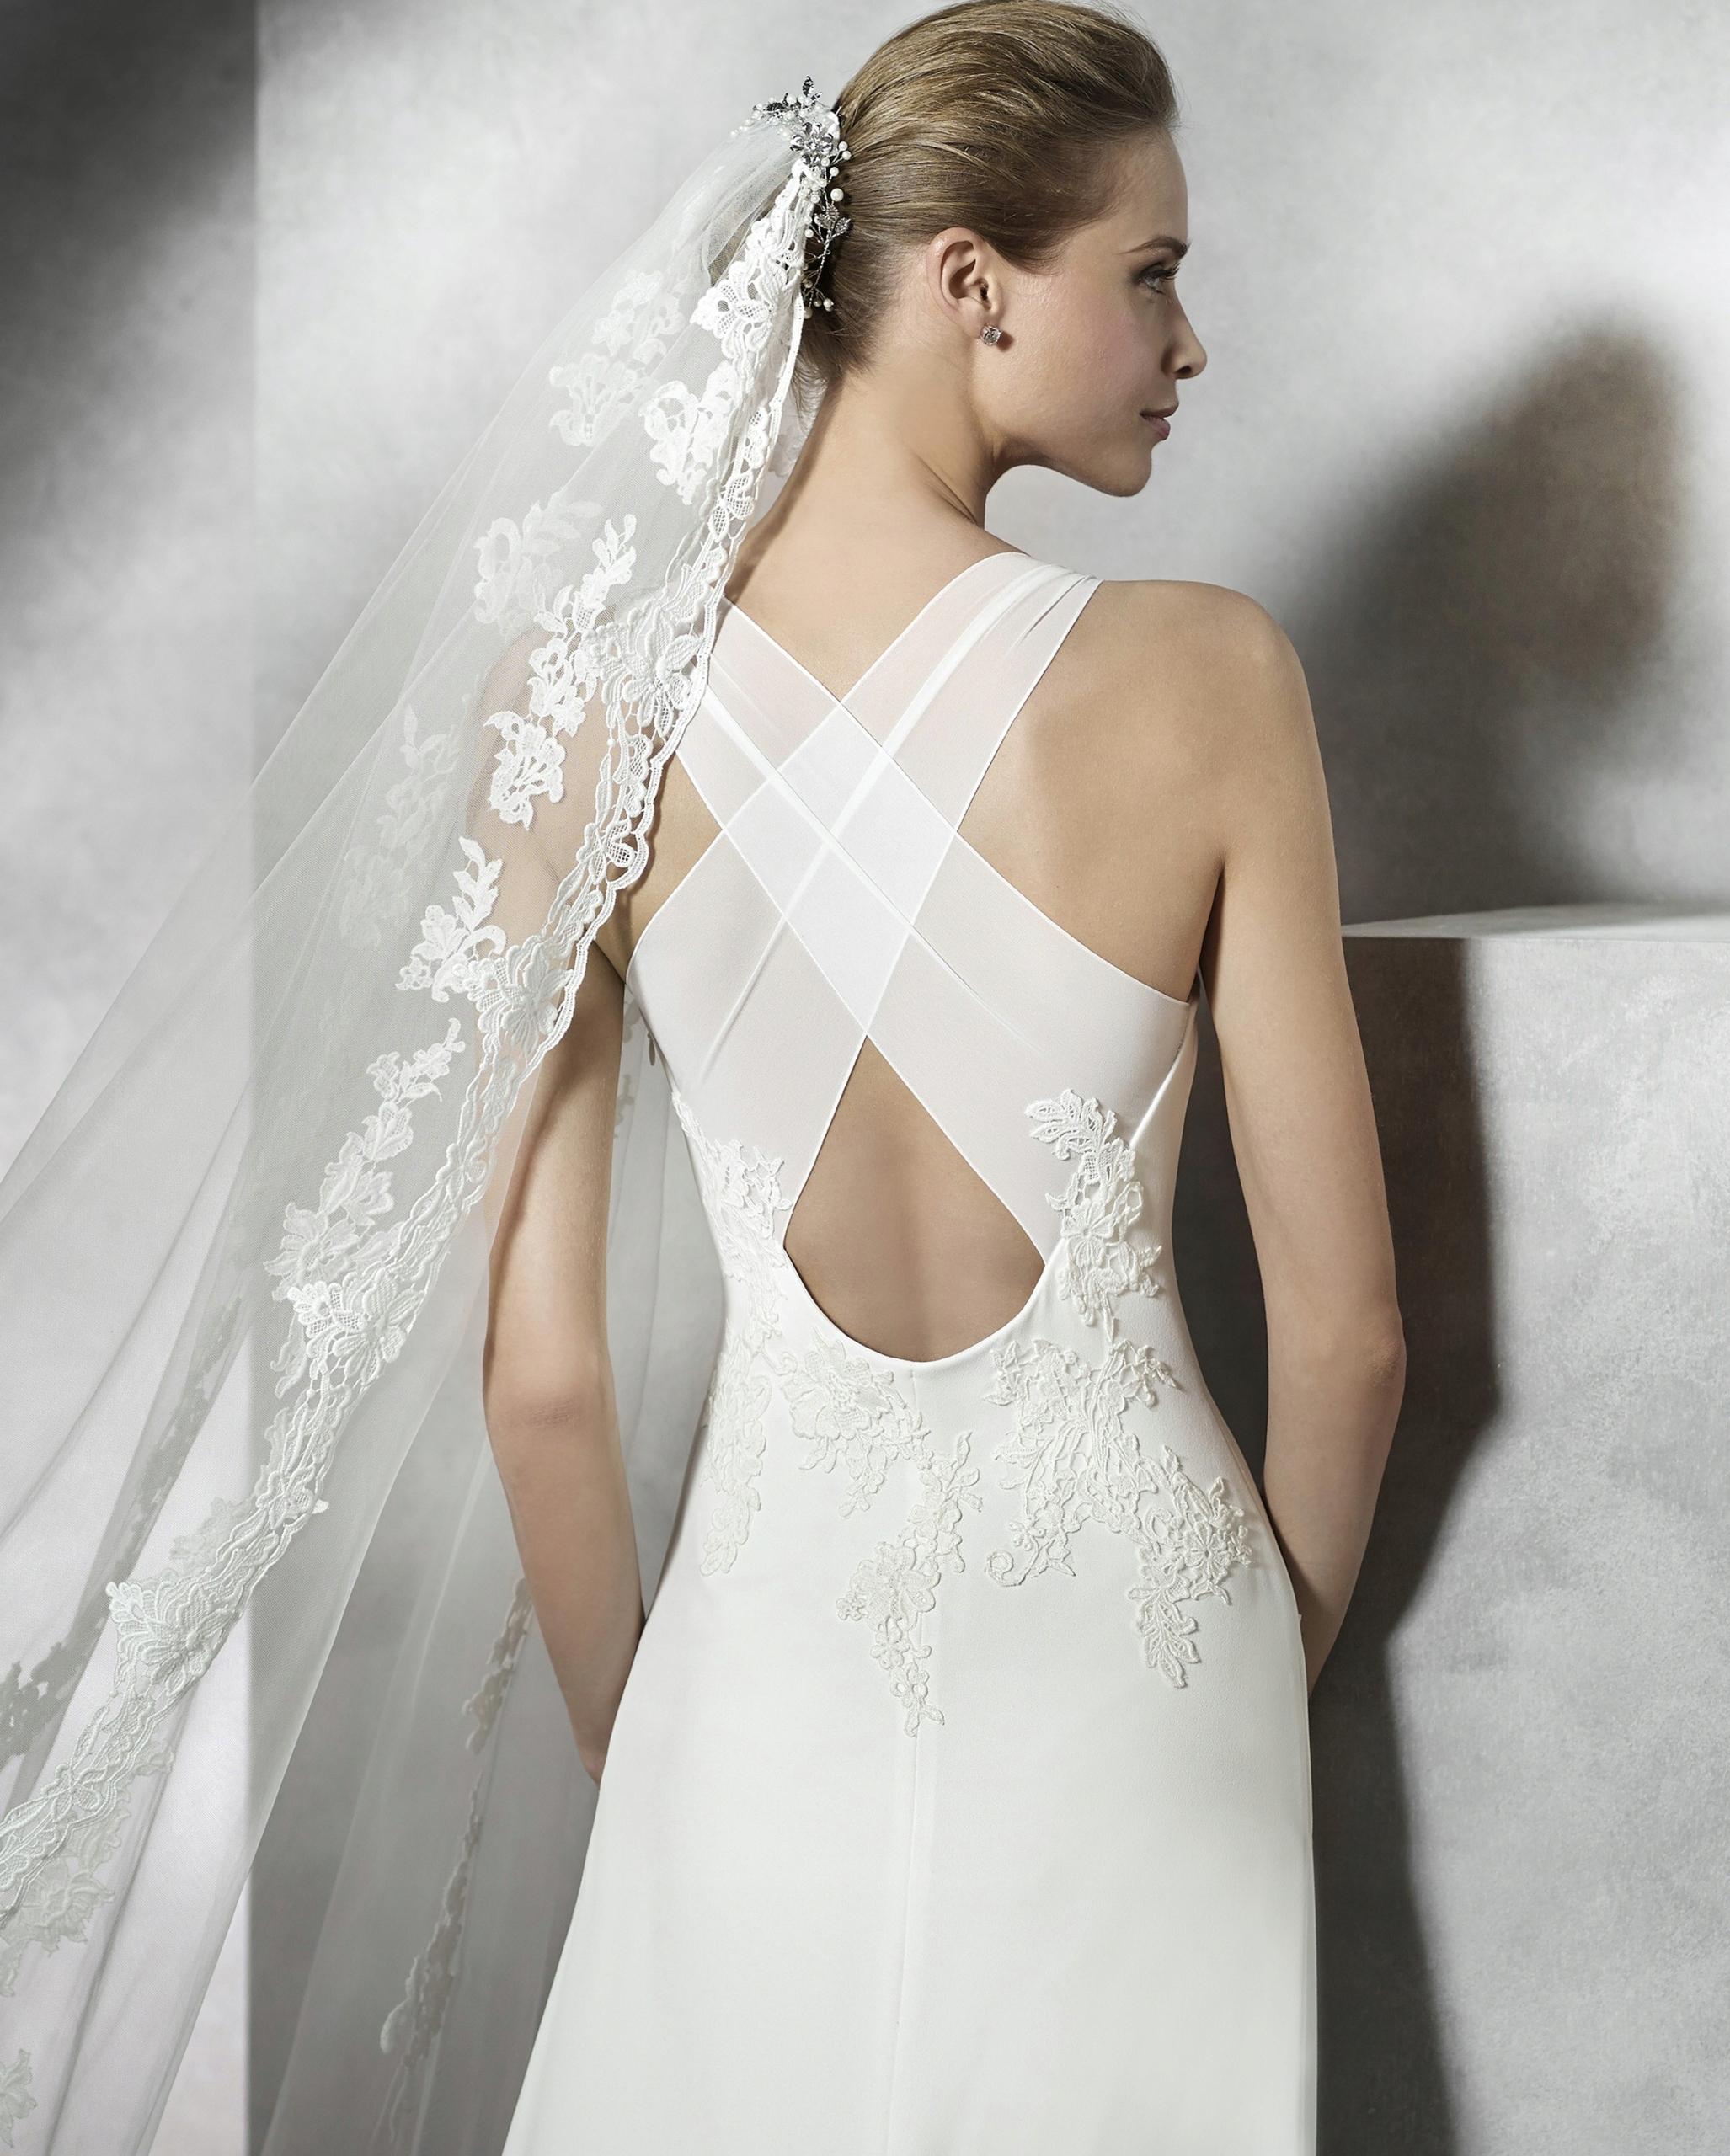 Suknia ślubna Pronovias Tori 36 S Elegancka Nowa 7611662885